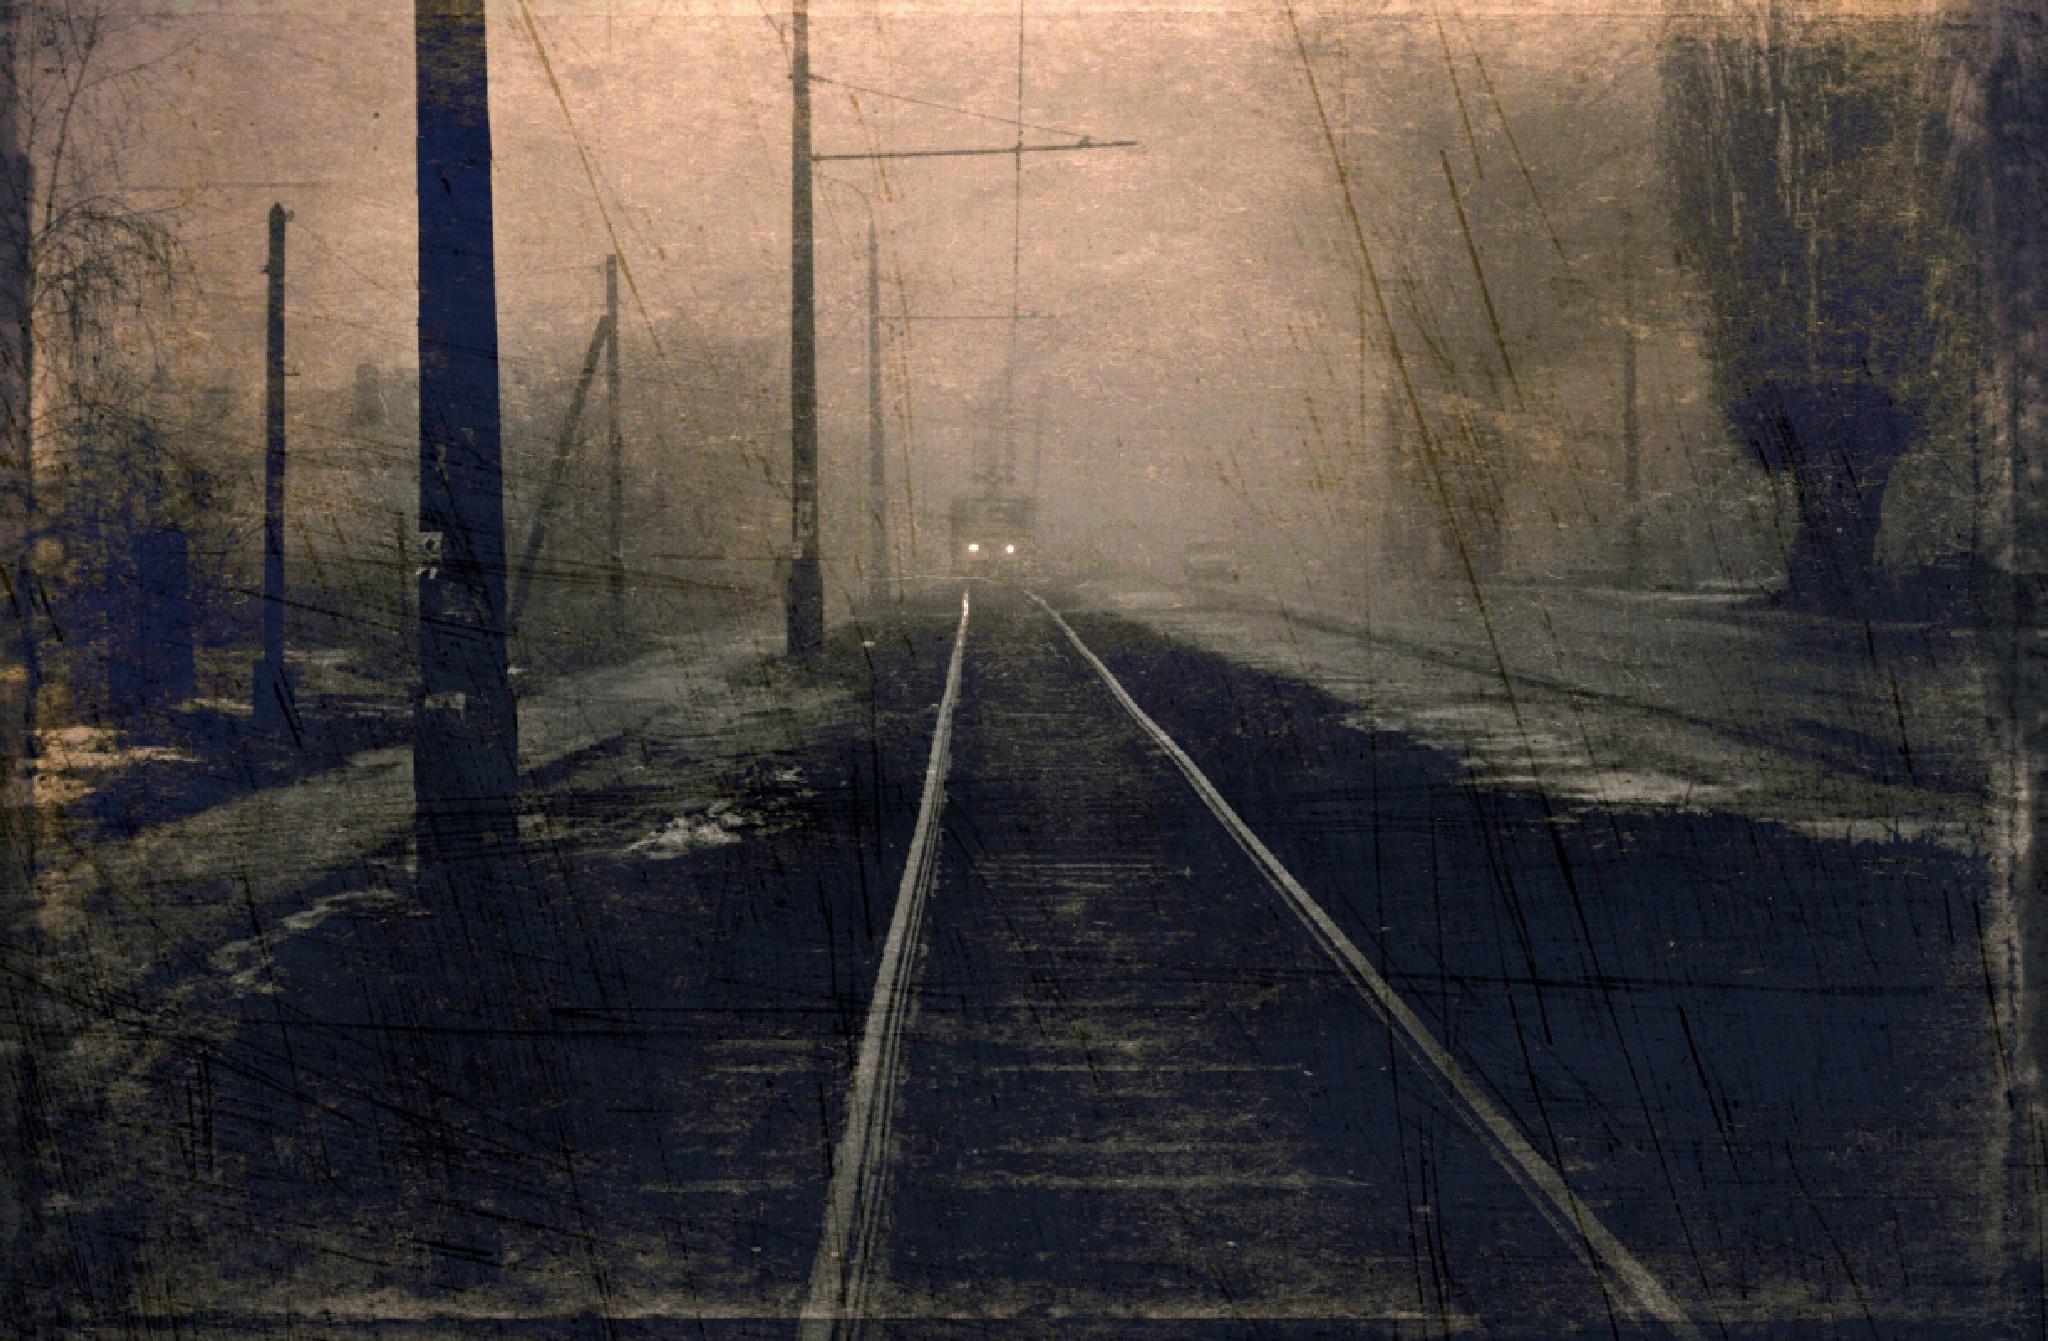 Early tram by Bobbyus